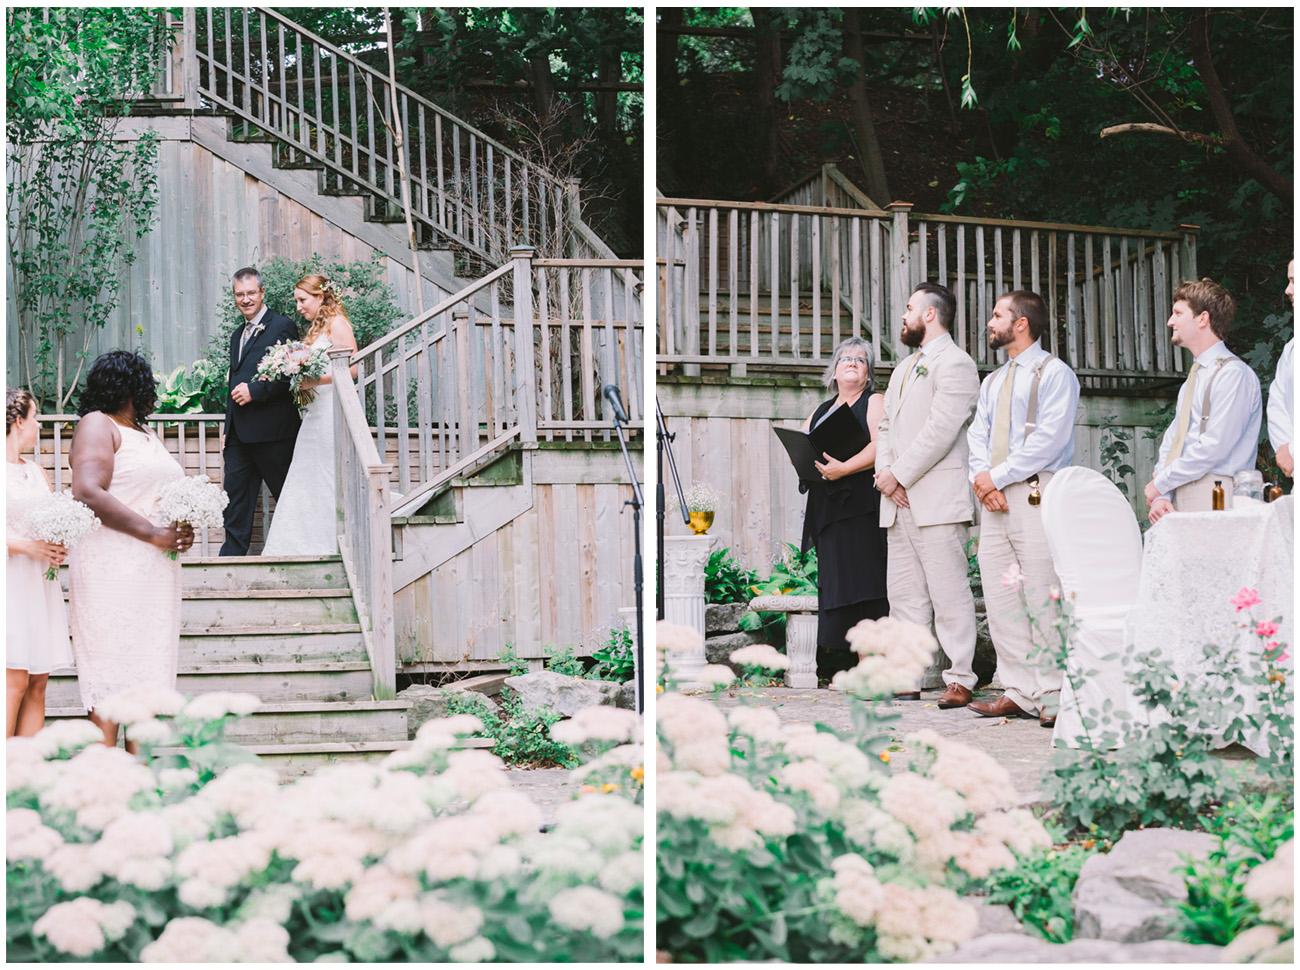 Wedding Ceremony at Fantasy Farm in Toronto